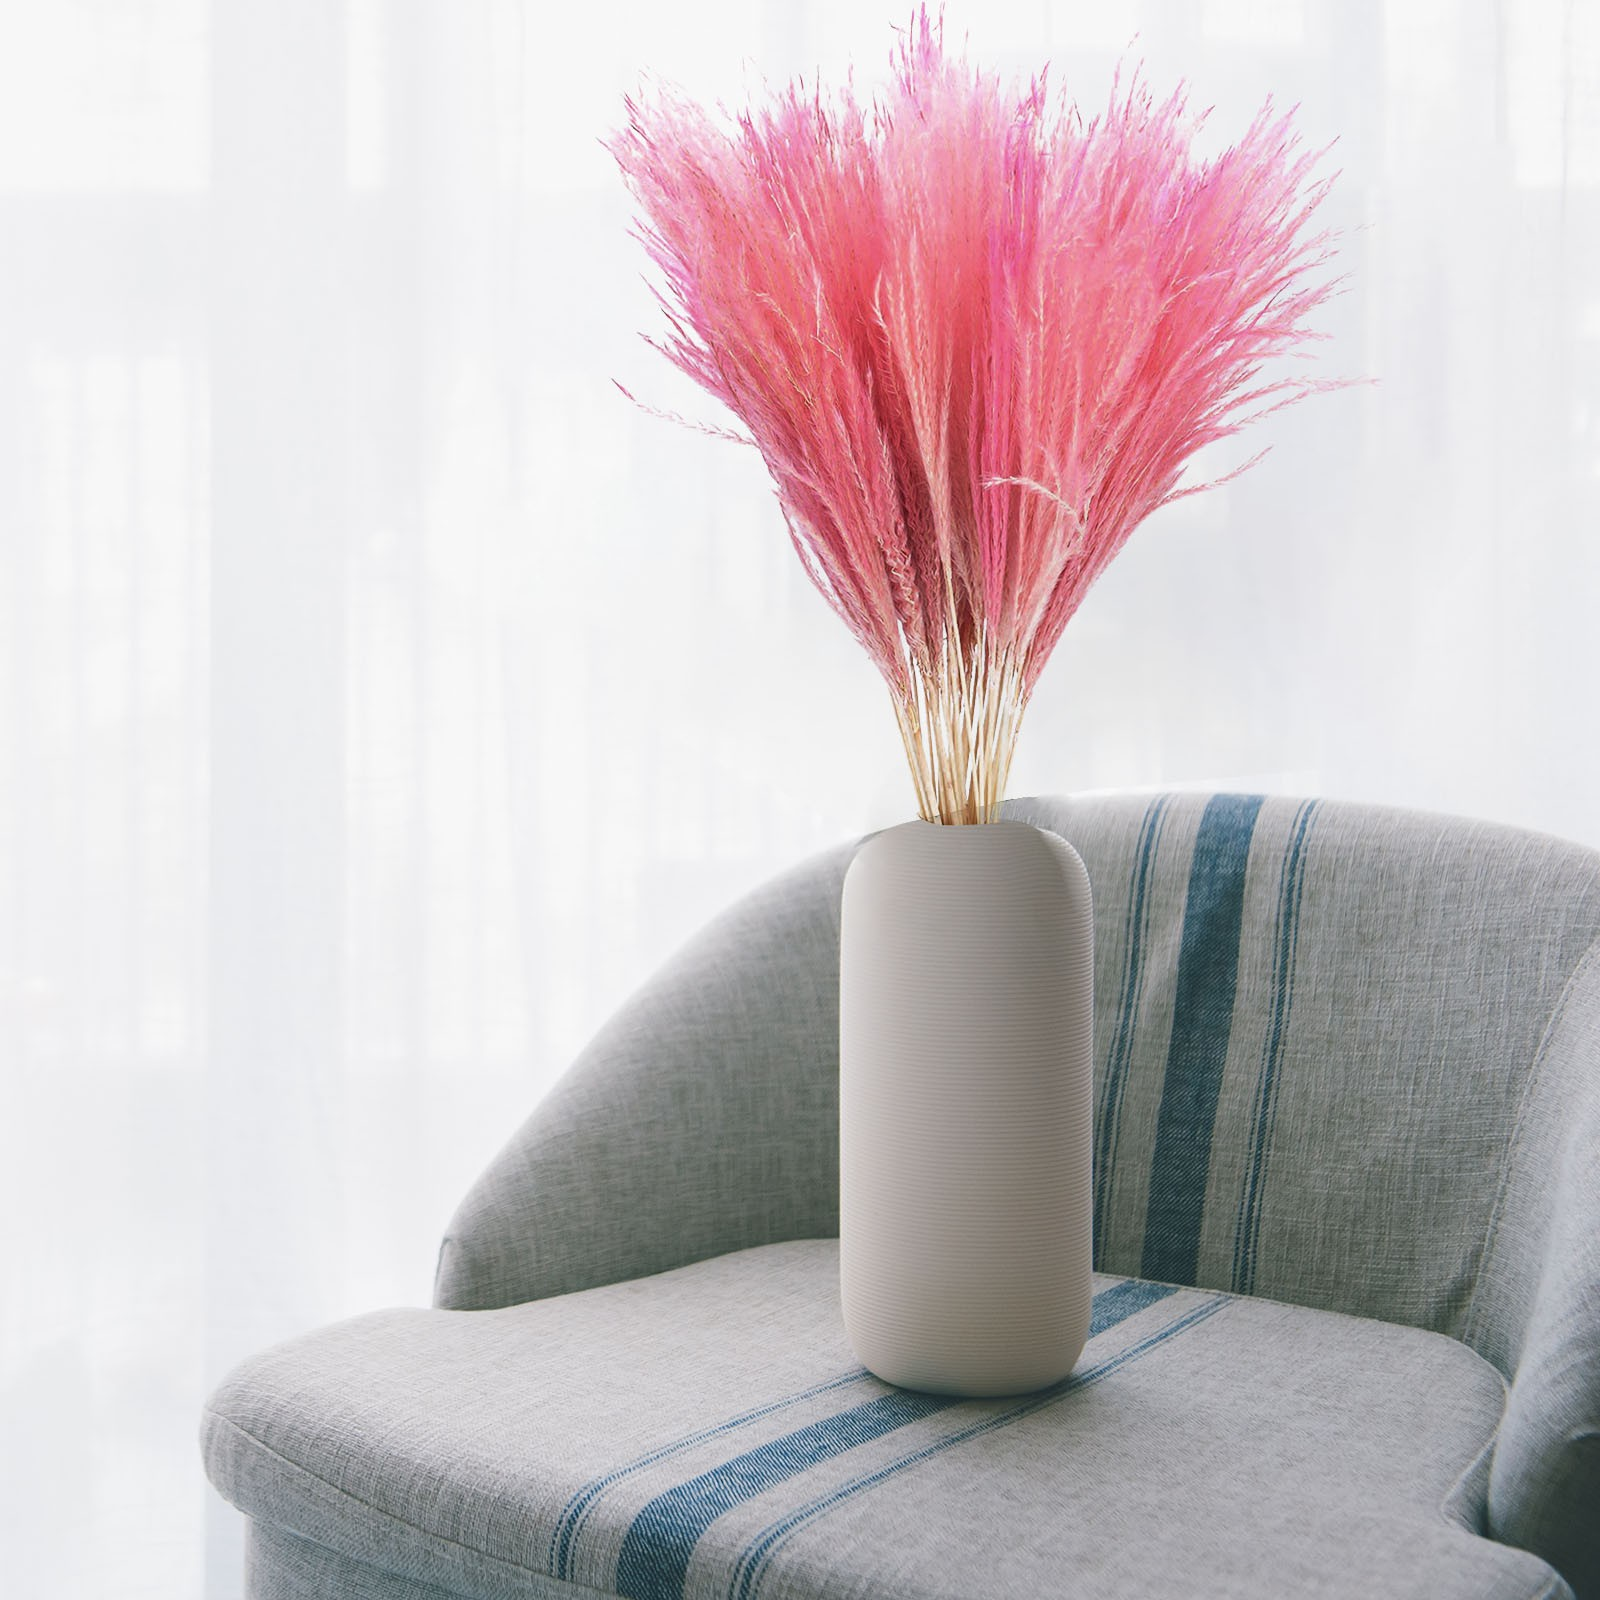 Living Room Artificial Flowers Bedroom, Living Room Decorative Accessories